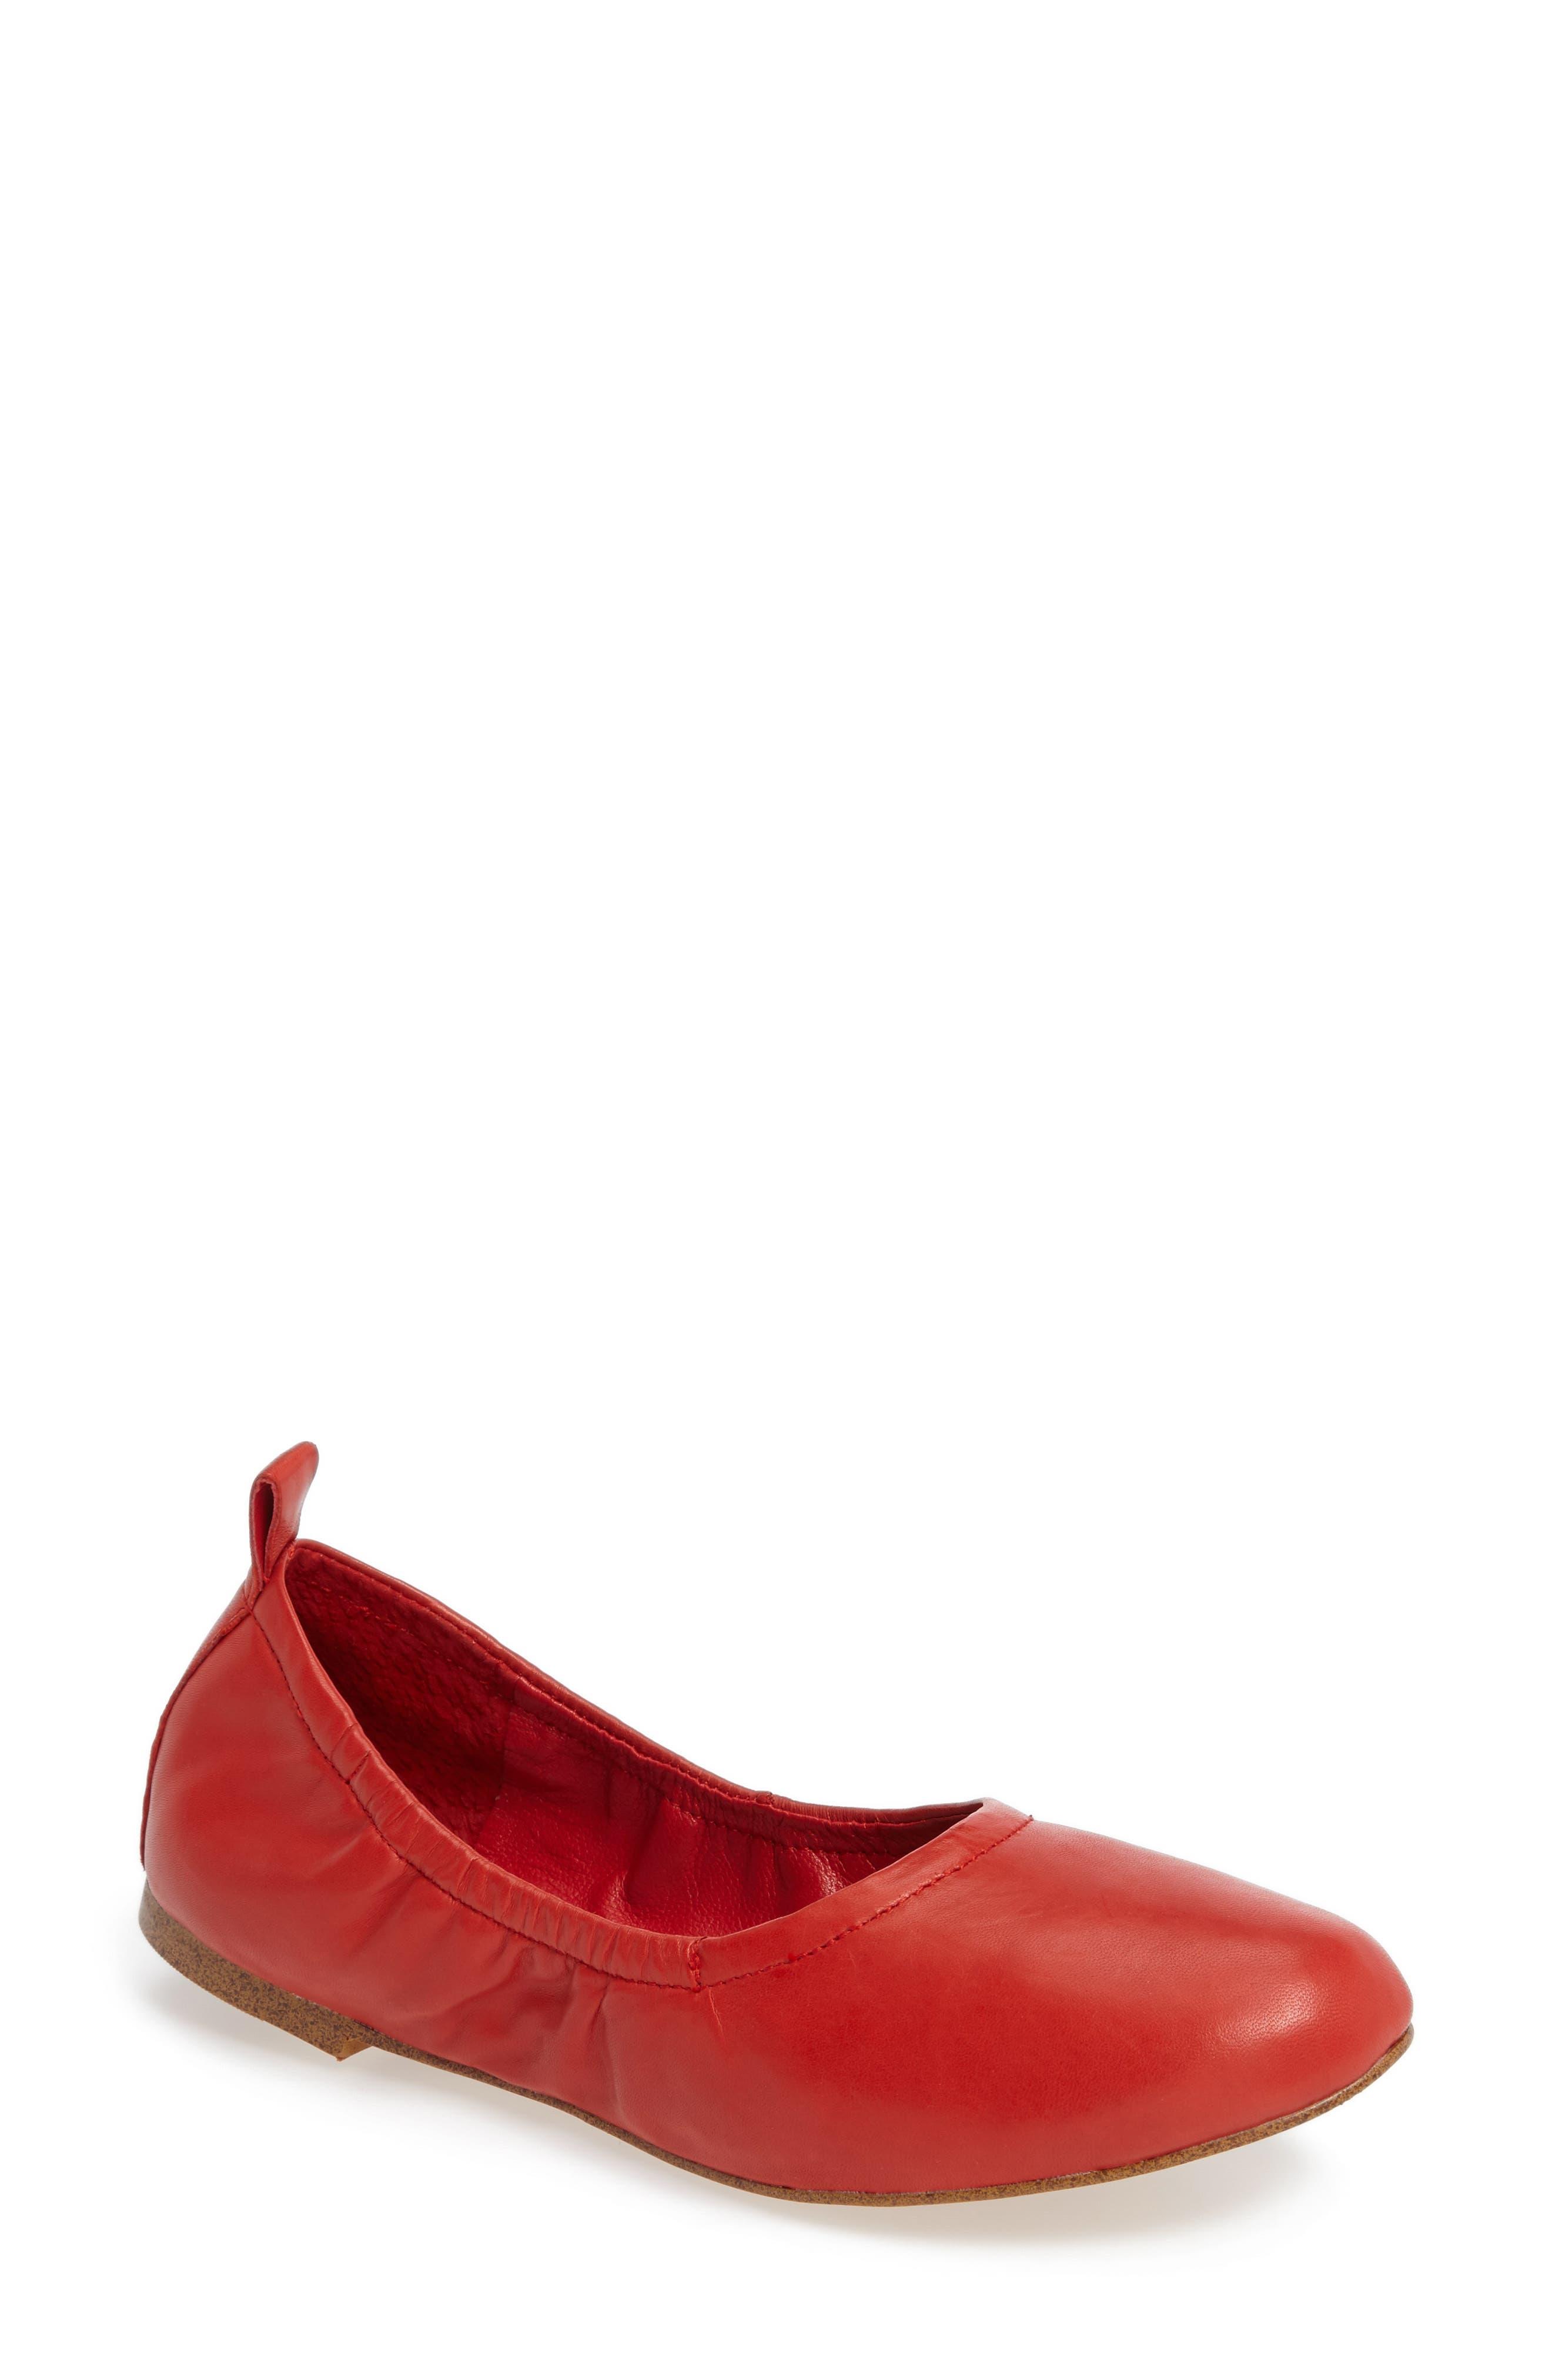 Alternate Image 1 Selected - 1.STATE Salen Ballet Flat (Women)